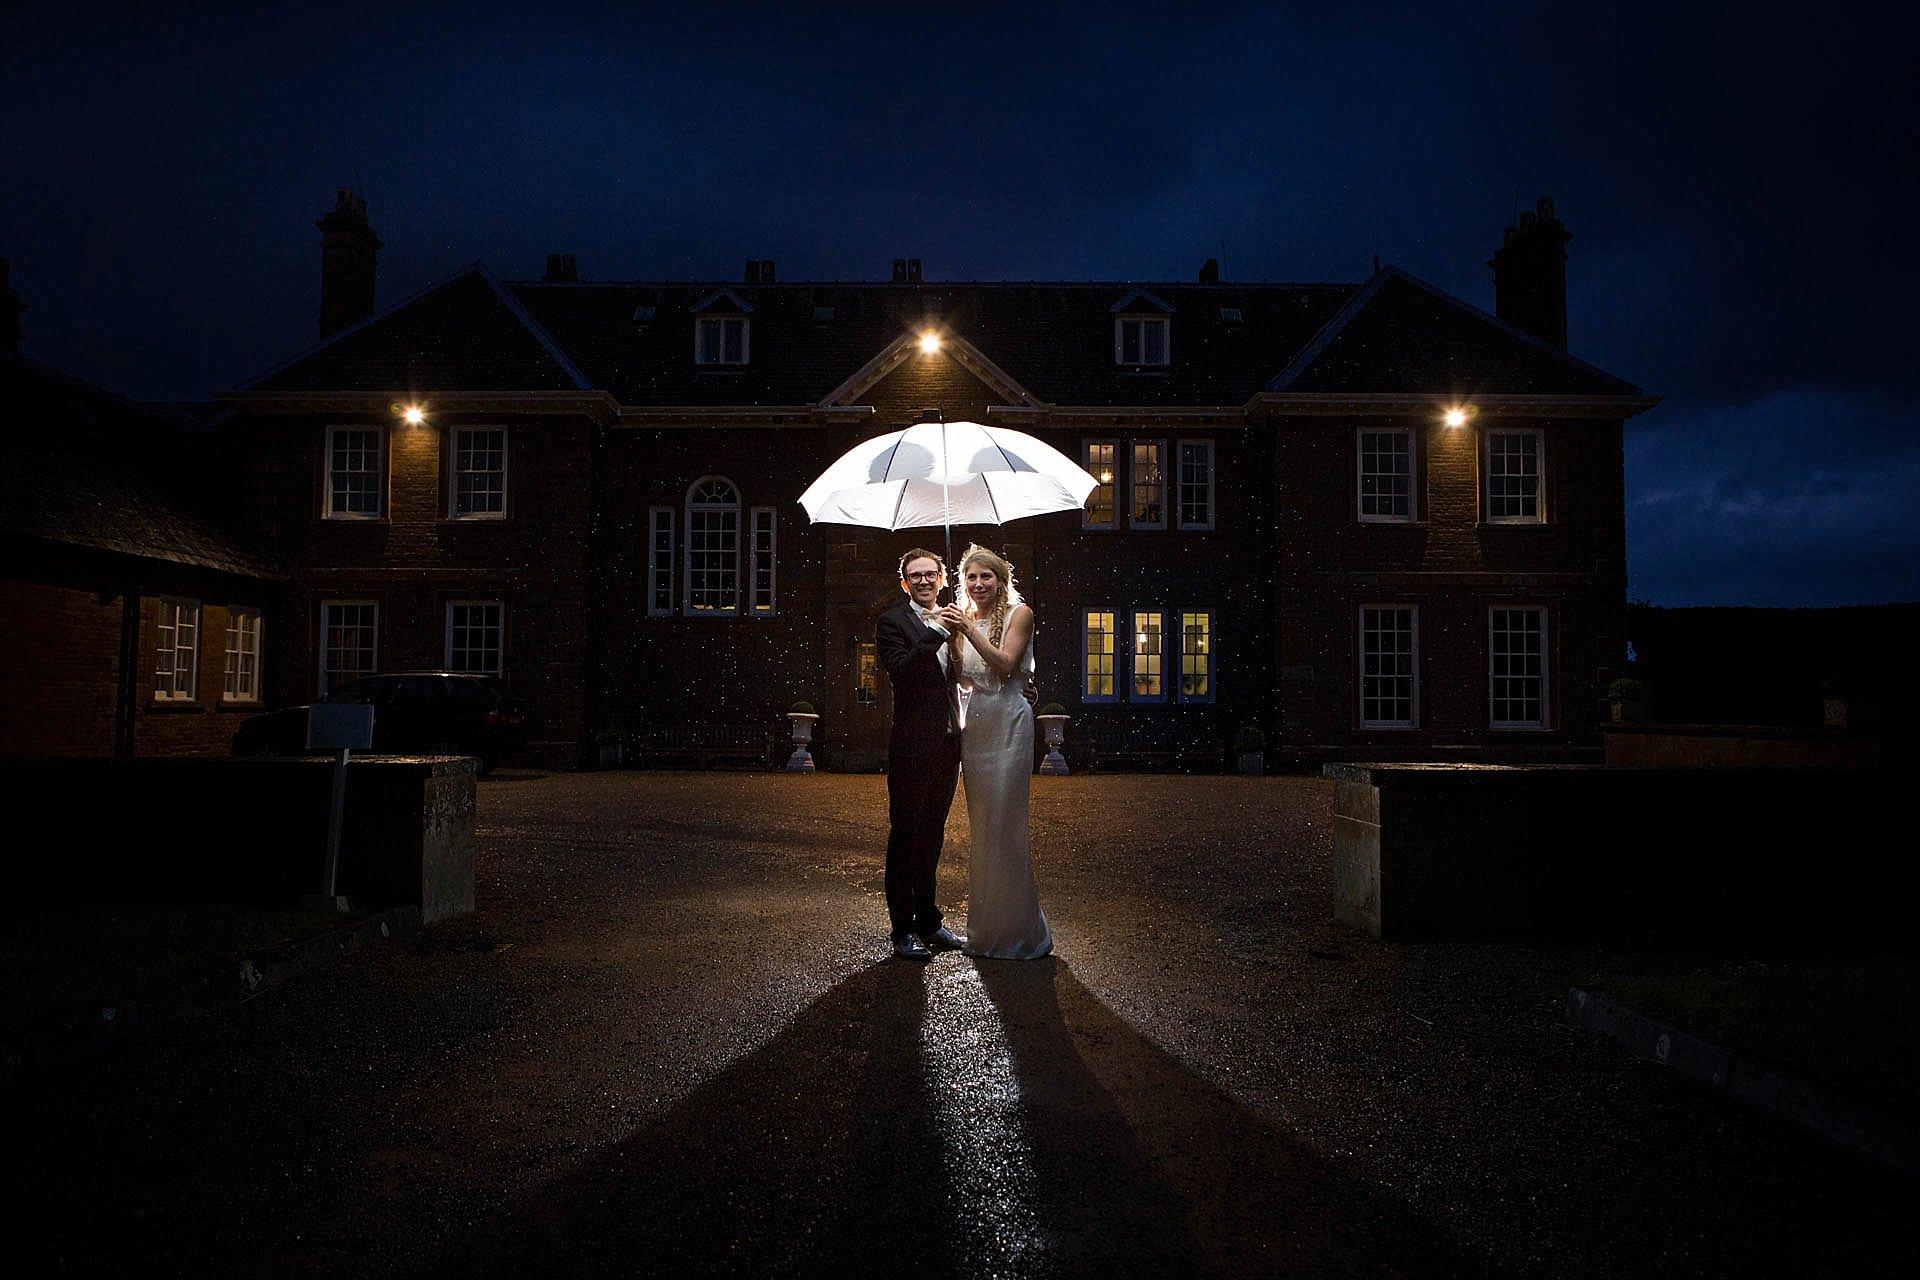 Alicia and Matthew at Poundon House